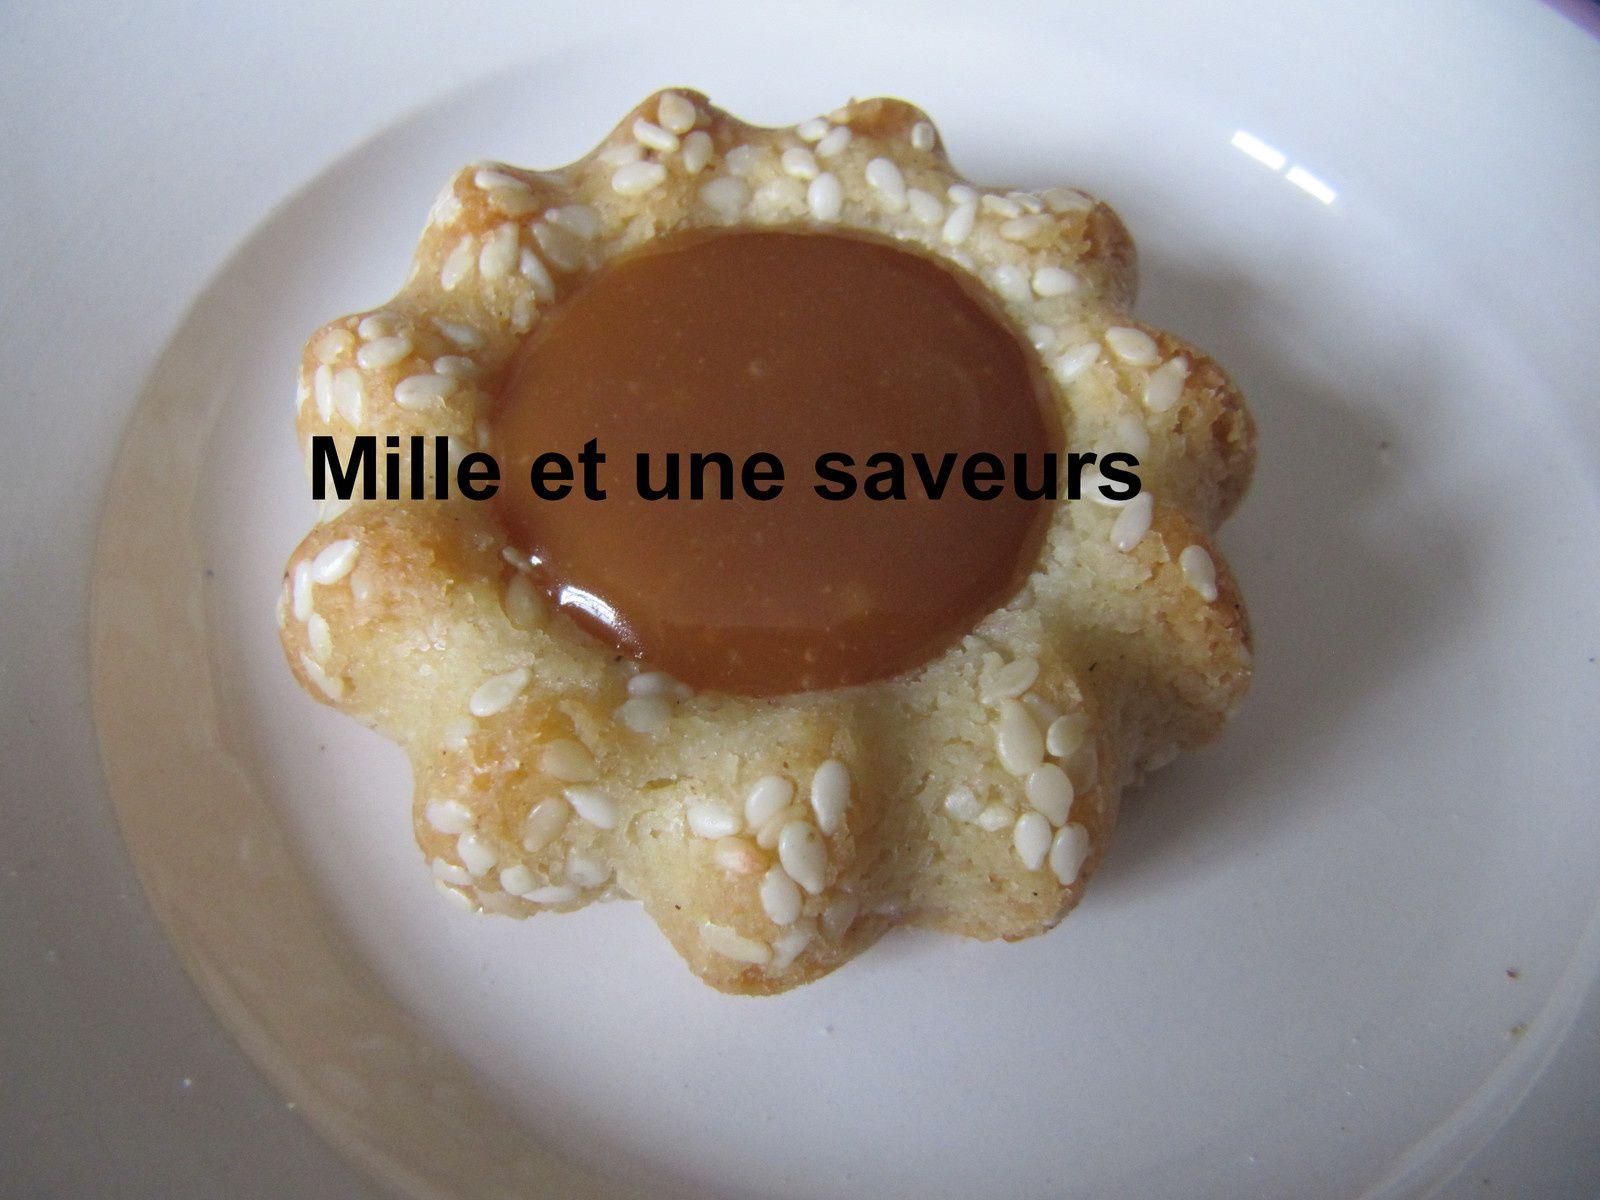 Petits fondants au caramel beurre salé